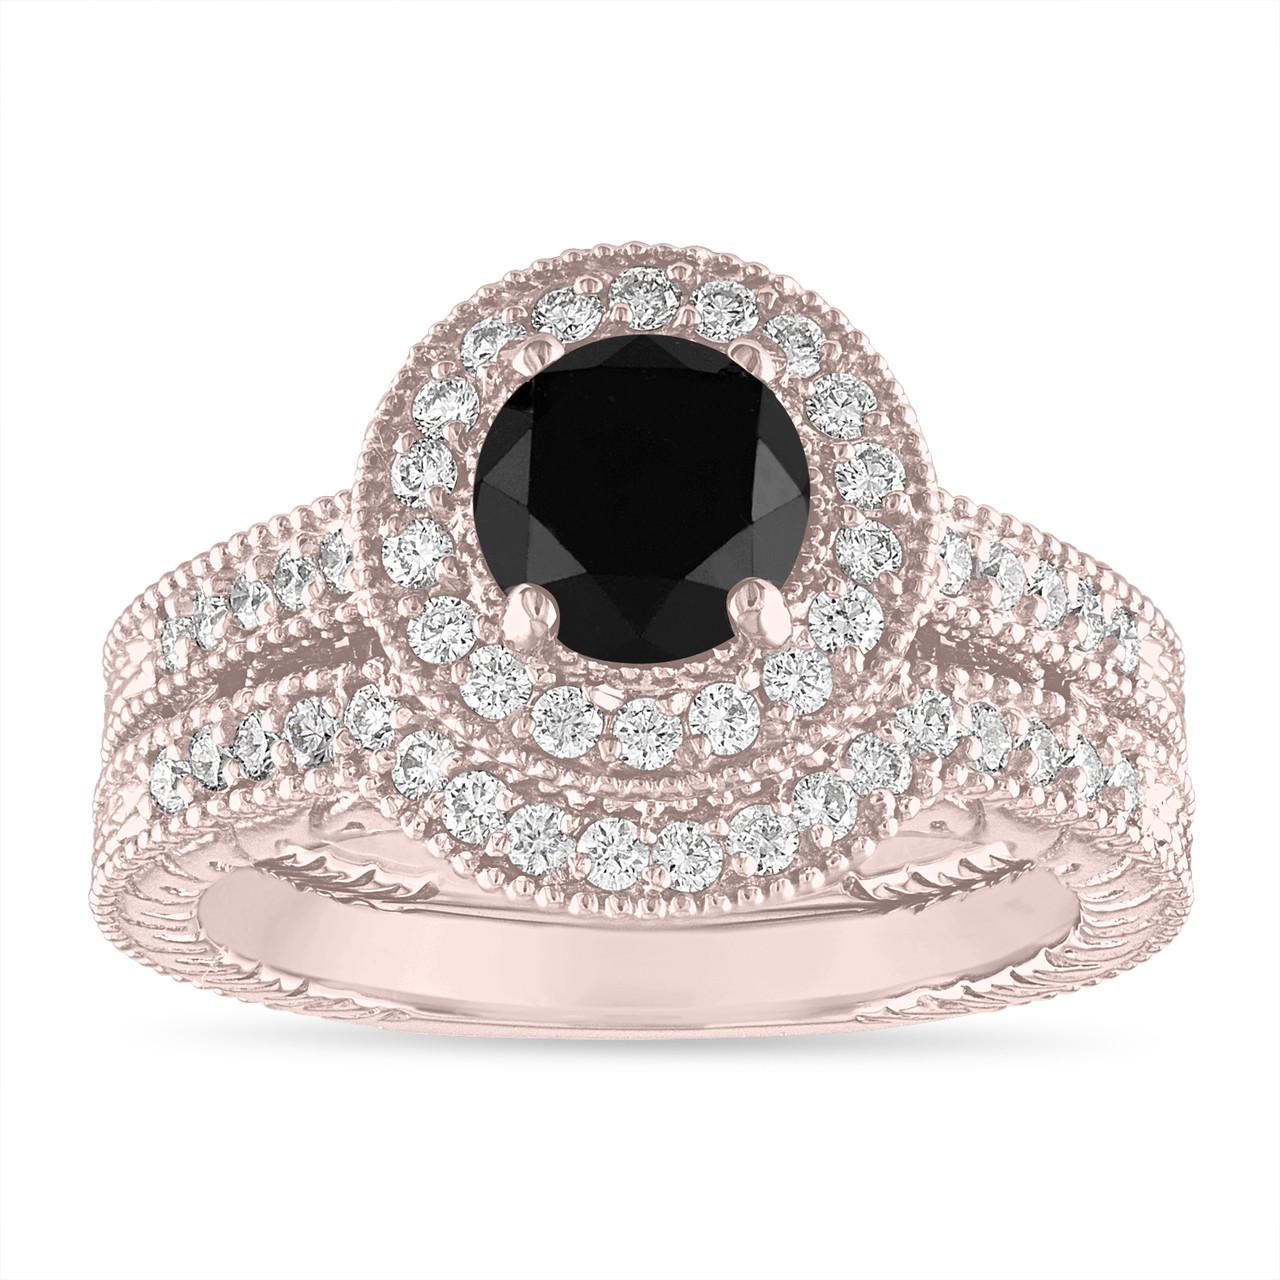 Black Diamond Engagement Ring Set Wedding Rings Sets 14k Rose Gold Halo Pave Vintage Style Certified Handmade Unique